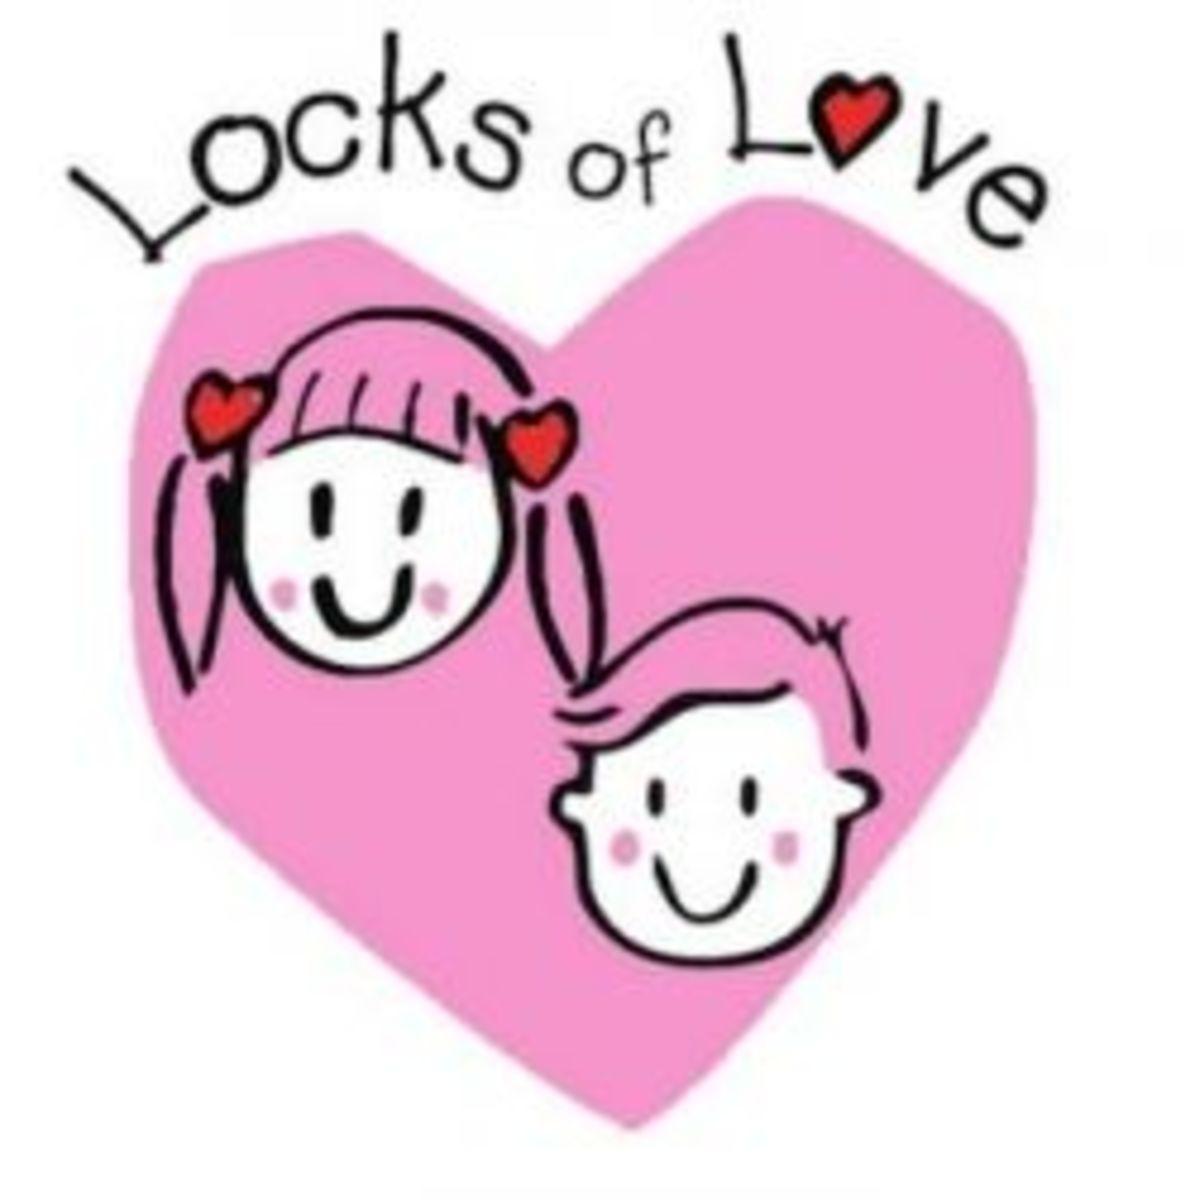 Locks of Love hair donation program